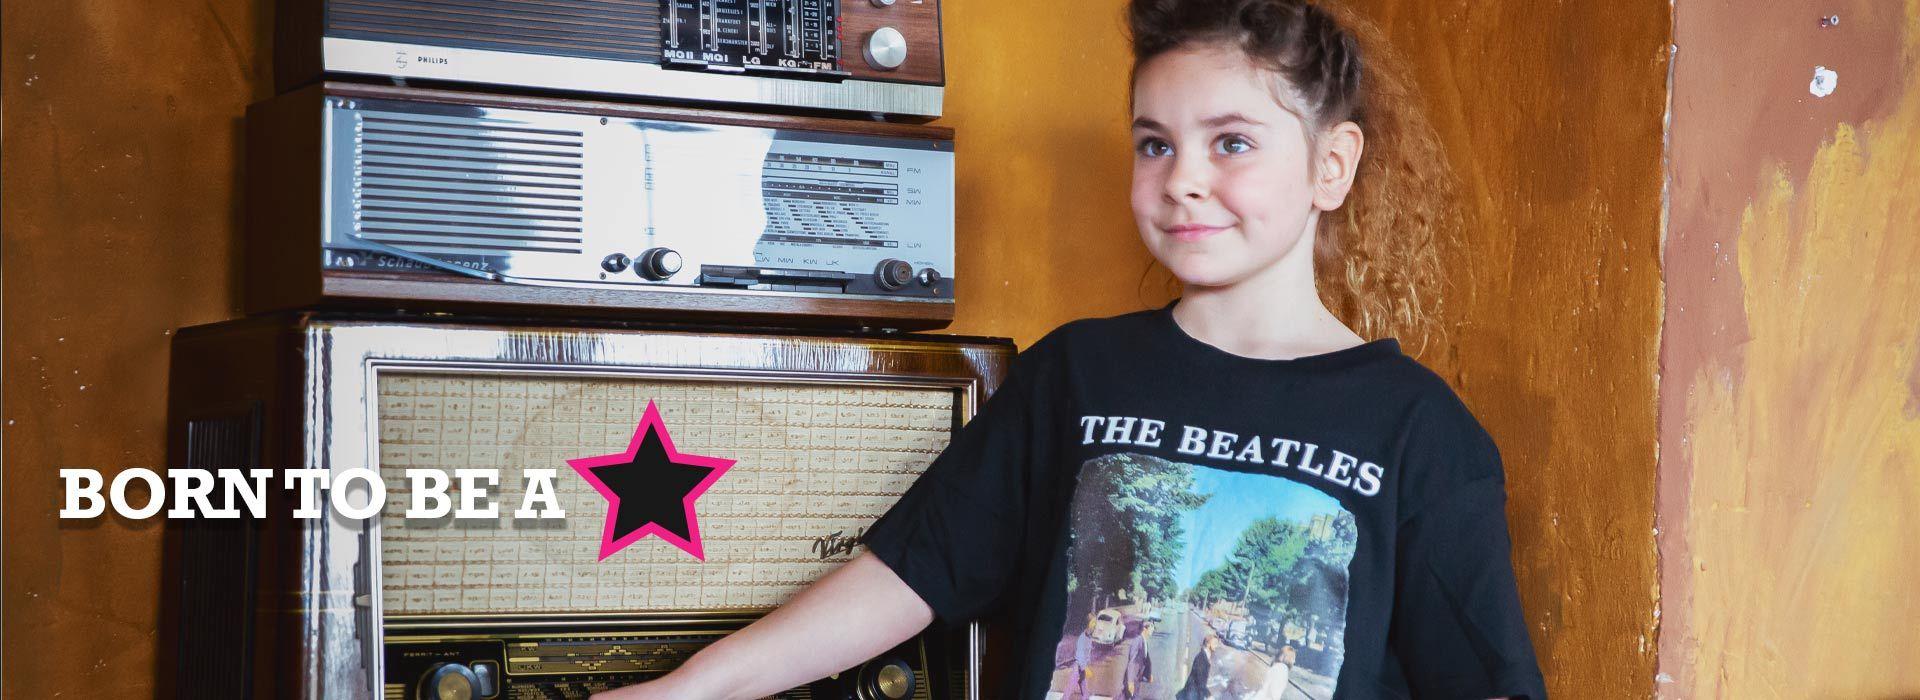 Rock kids kleding - The beatles Abbey Road T-shirt